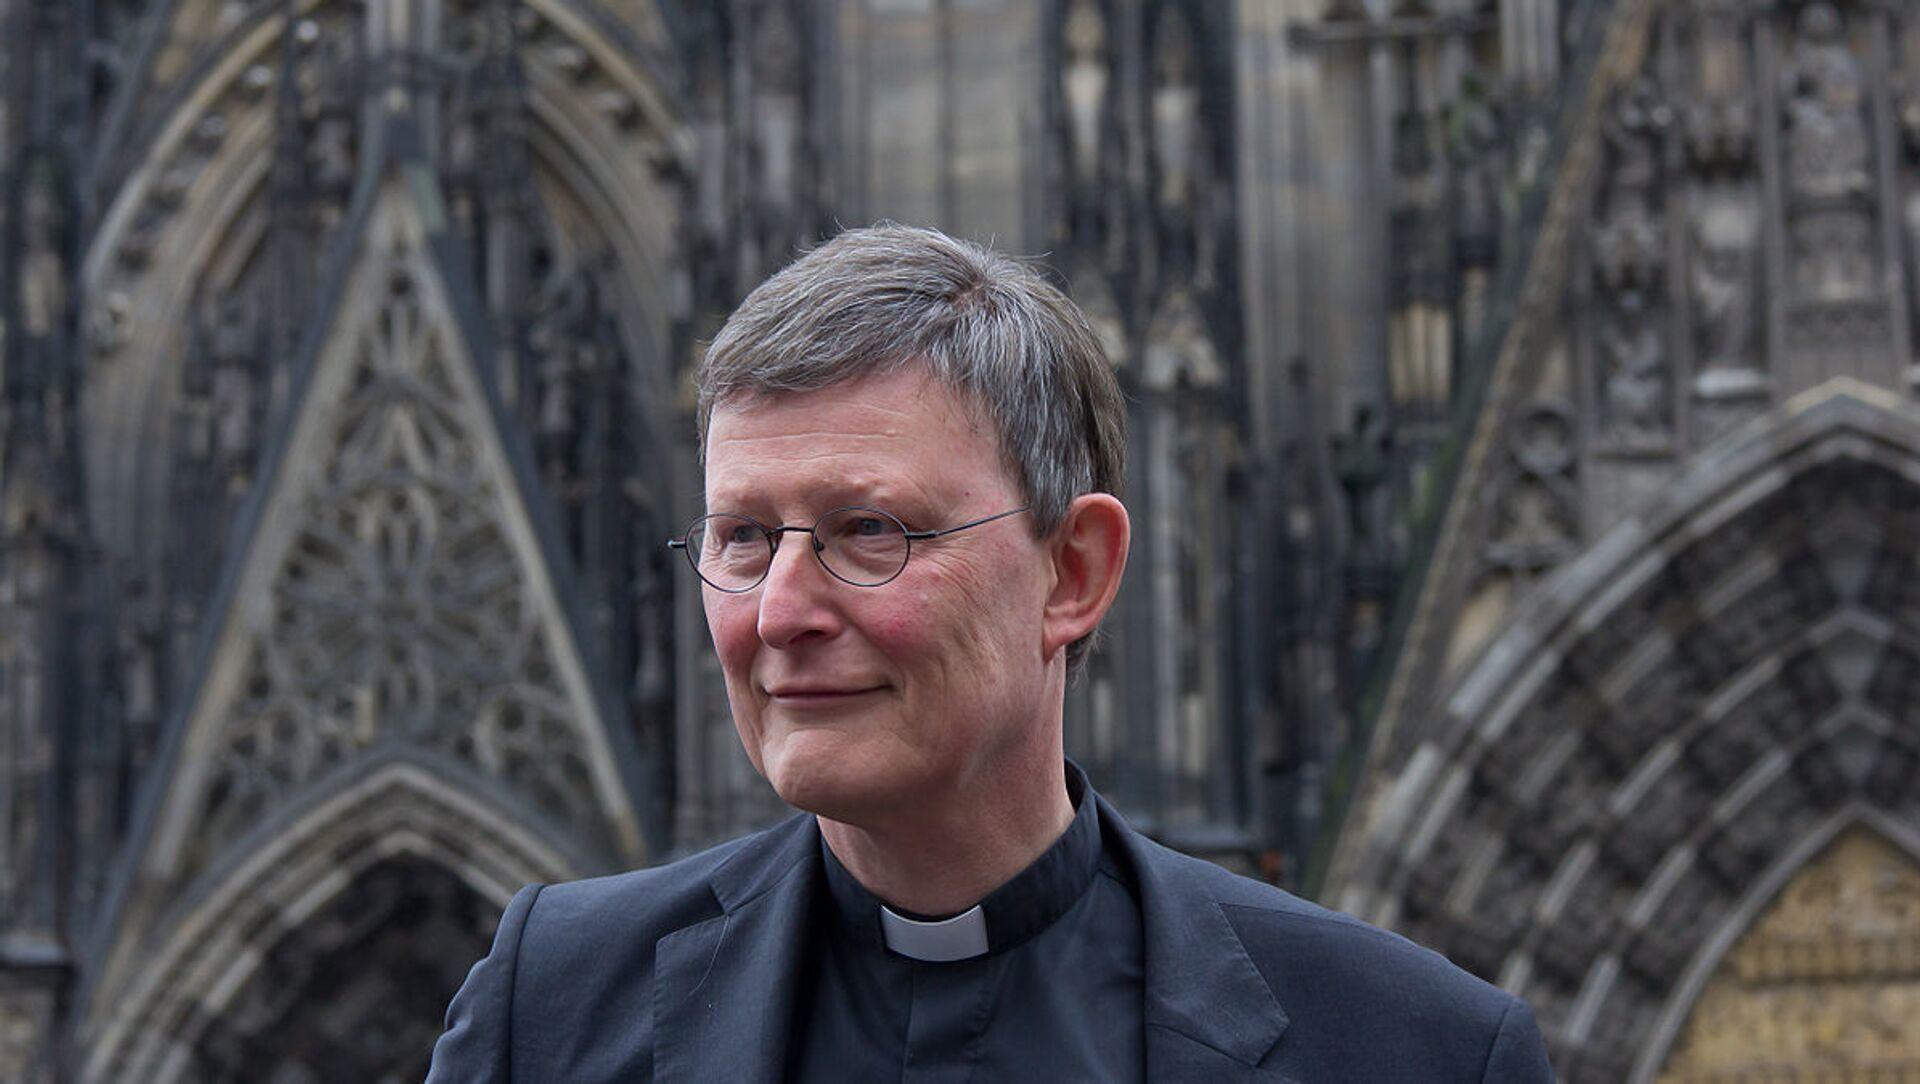 L'arcivescovo di Colonia Rainer Maria Woelki - Sputnik Italia, 1920, 01.02.2021